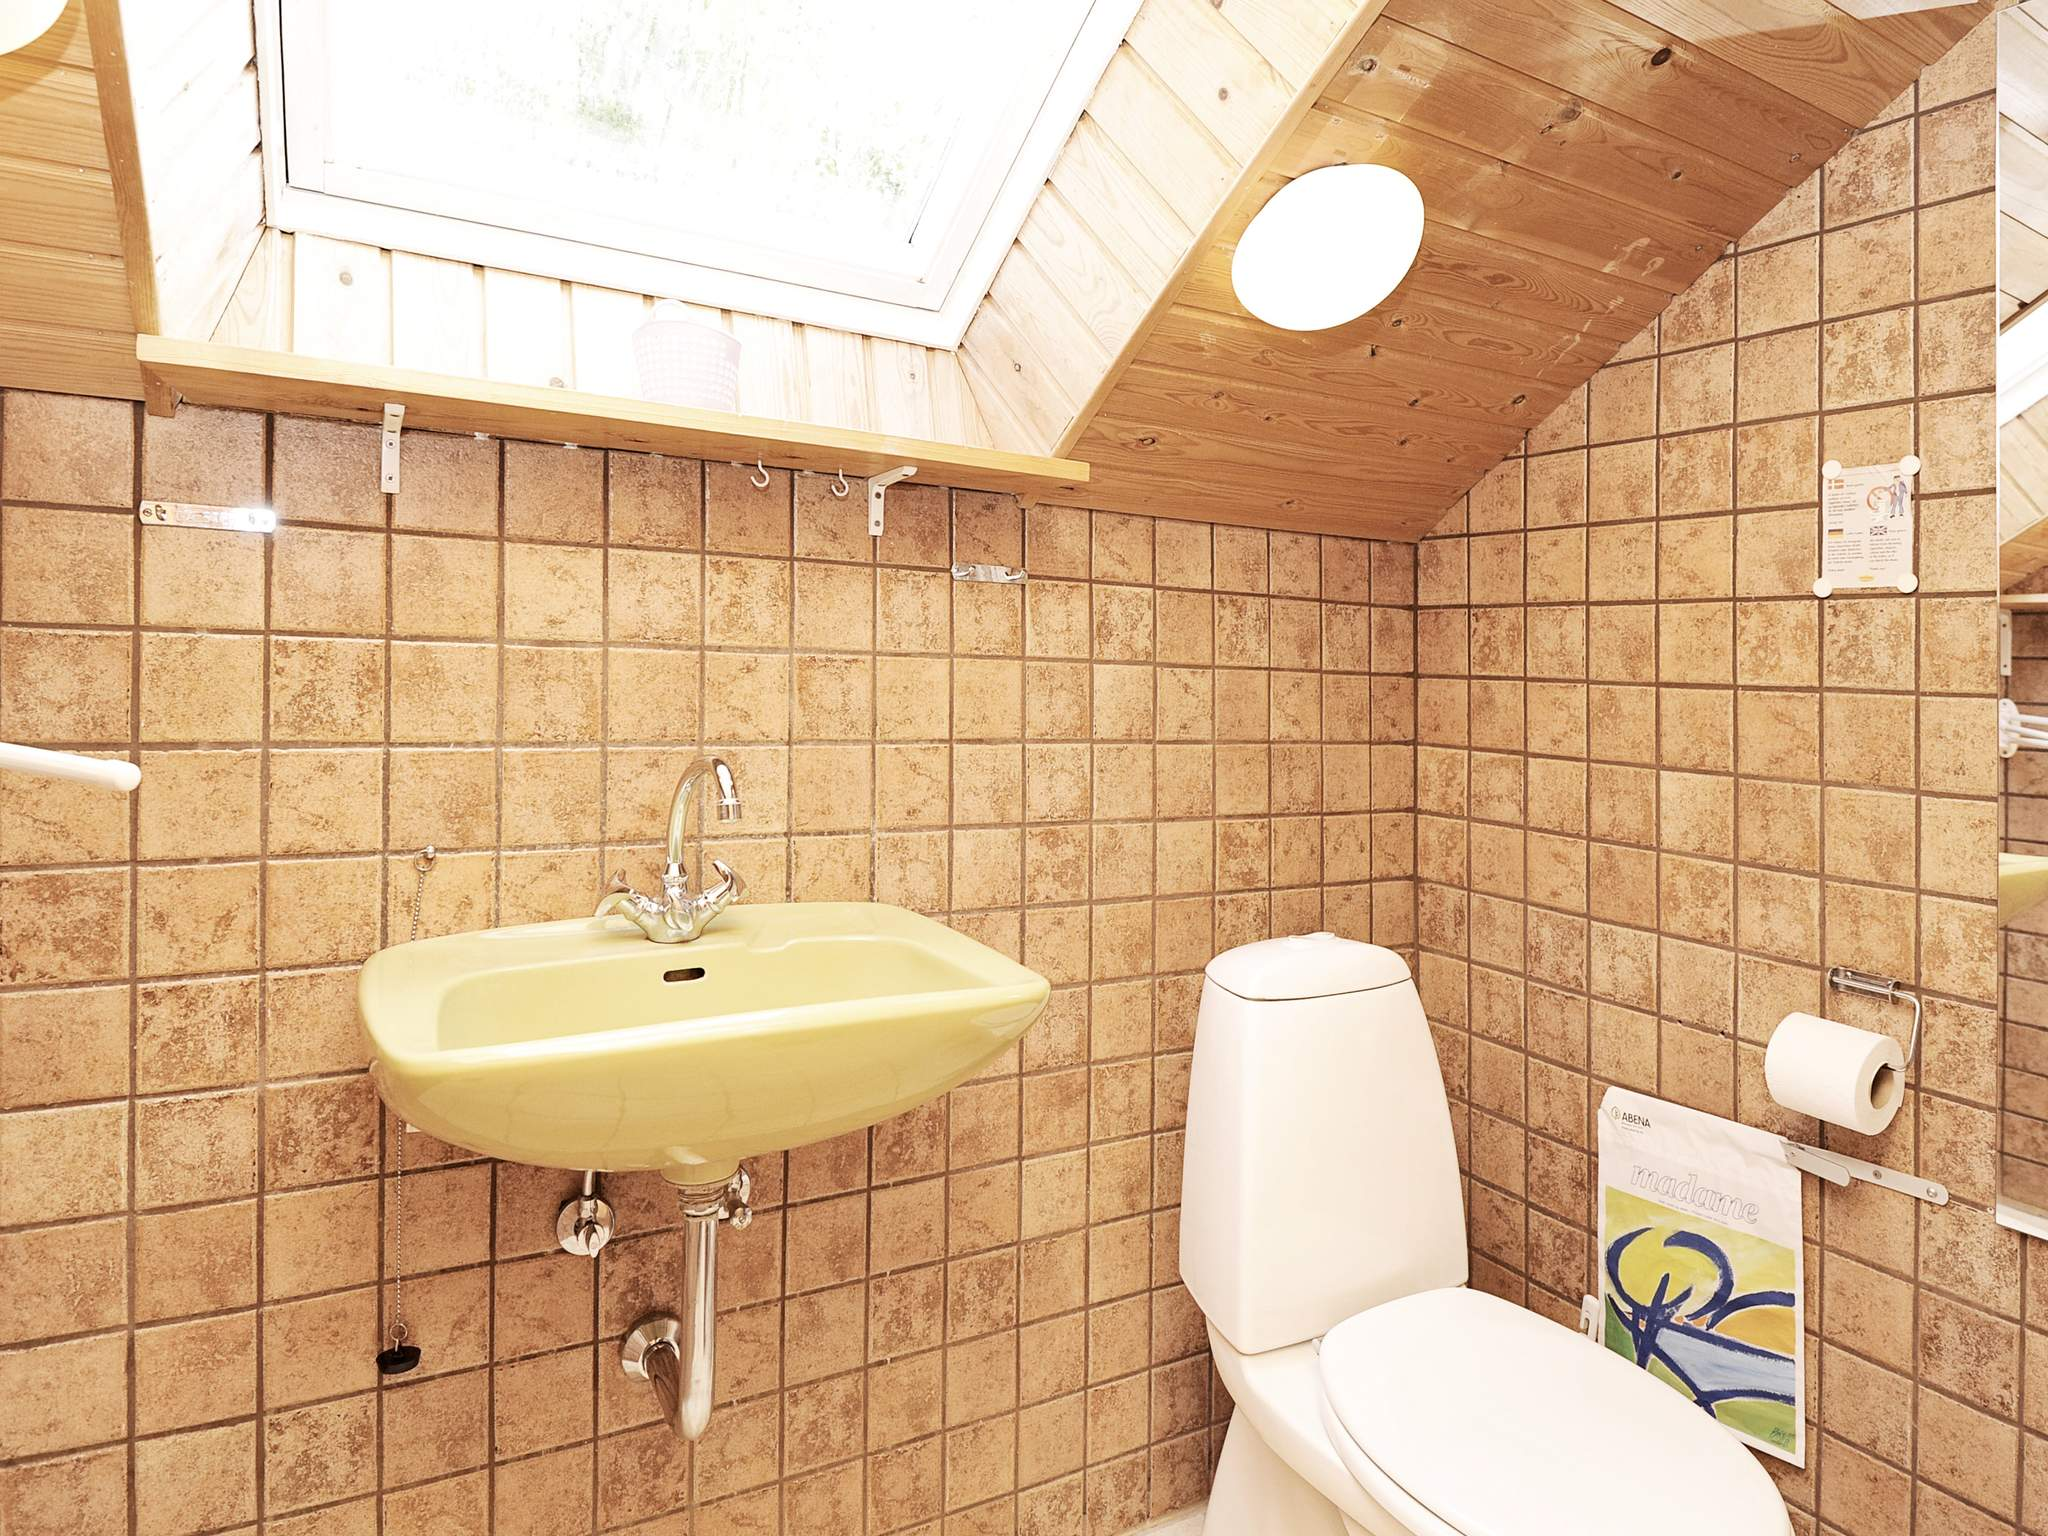 Ferienhaus Ry (83836), Ry, , Ostjütland, Dänemark, Bild 17